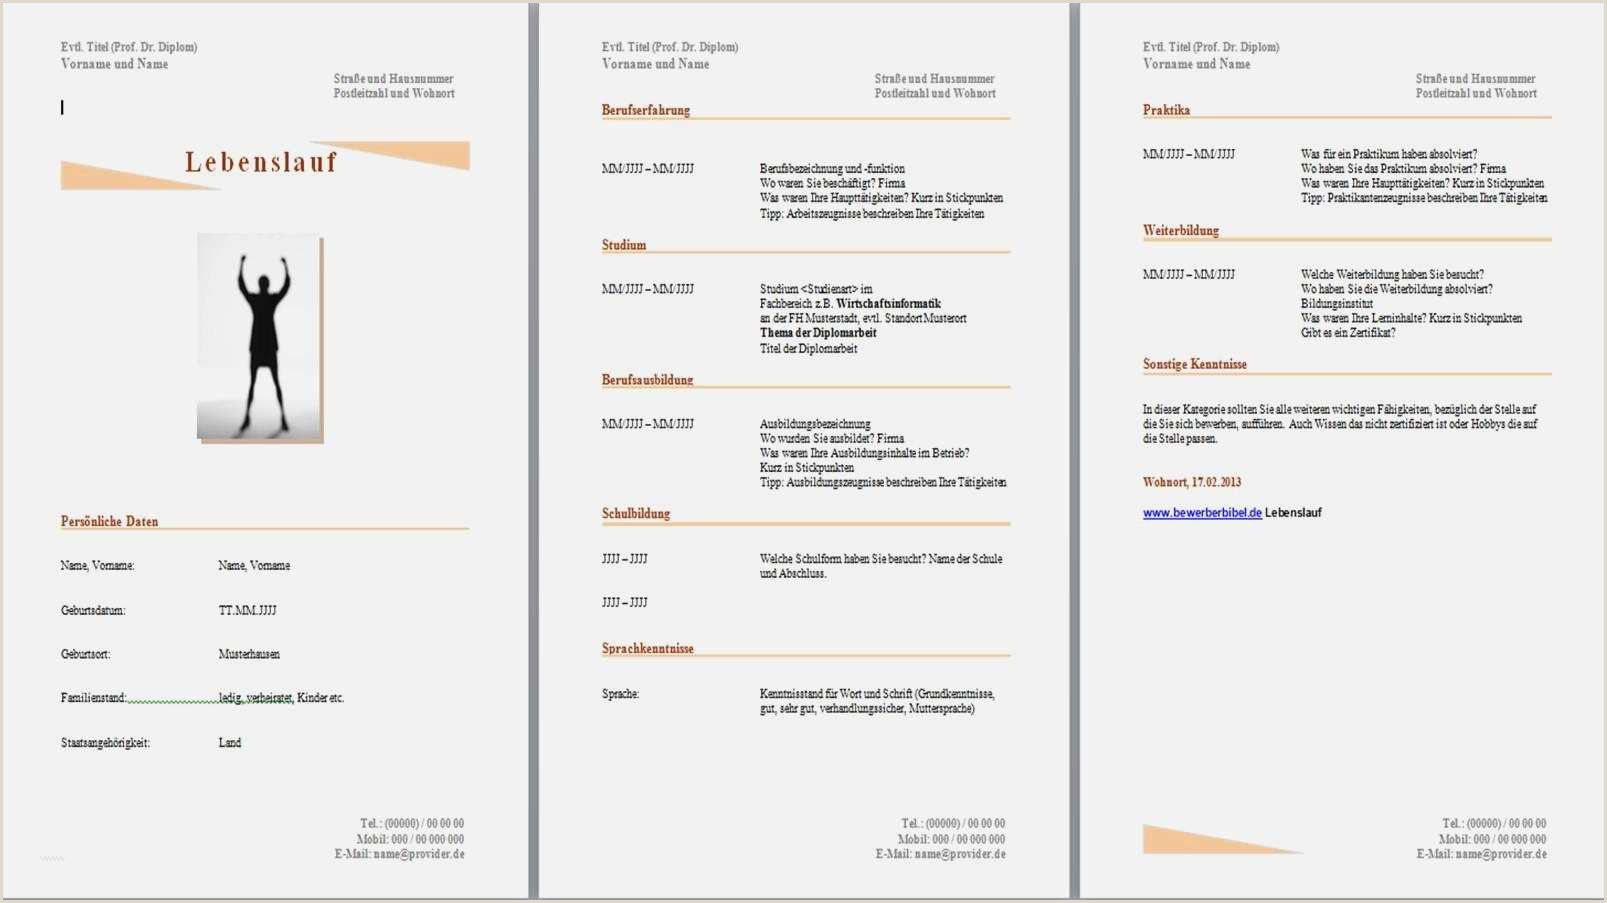 Lebenslauf Muster Ihk 10 Lebenslauf Muster Kostenlos Download townandlimo